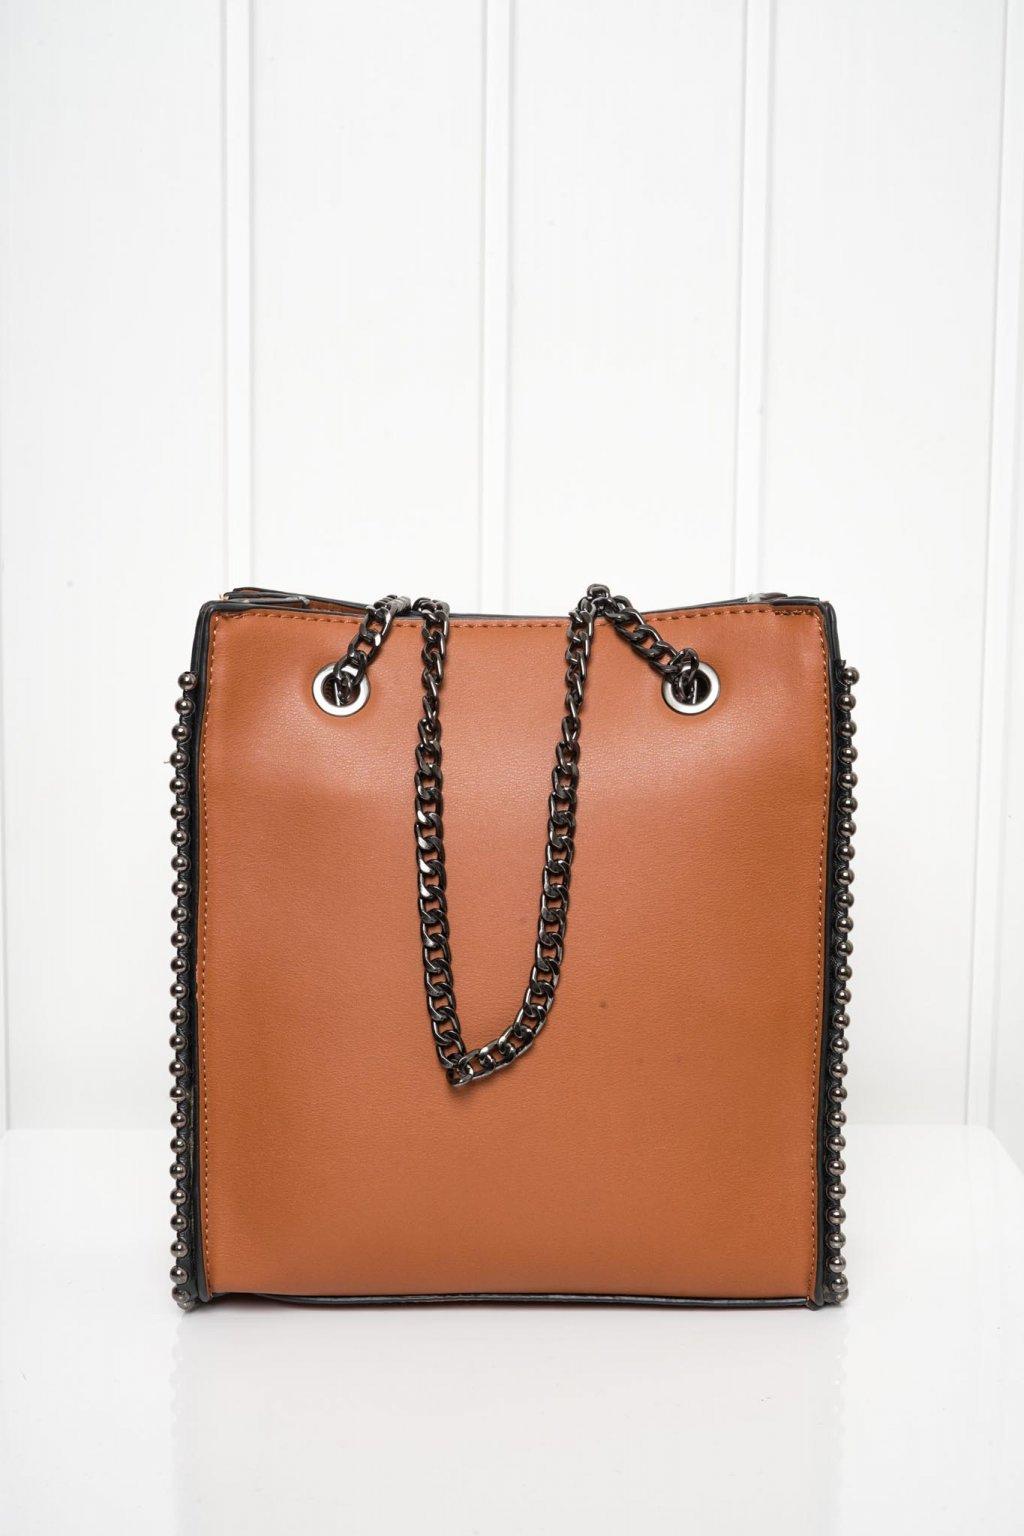 Kabelka, crossbody, ruksak, shopping bag, shopperka, 191